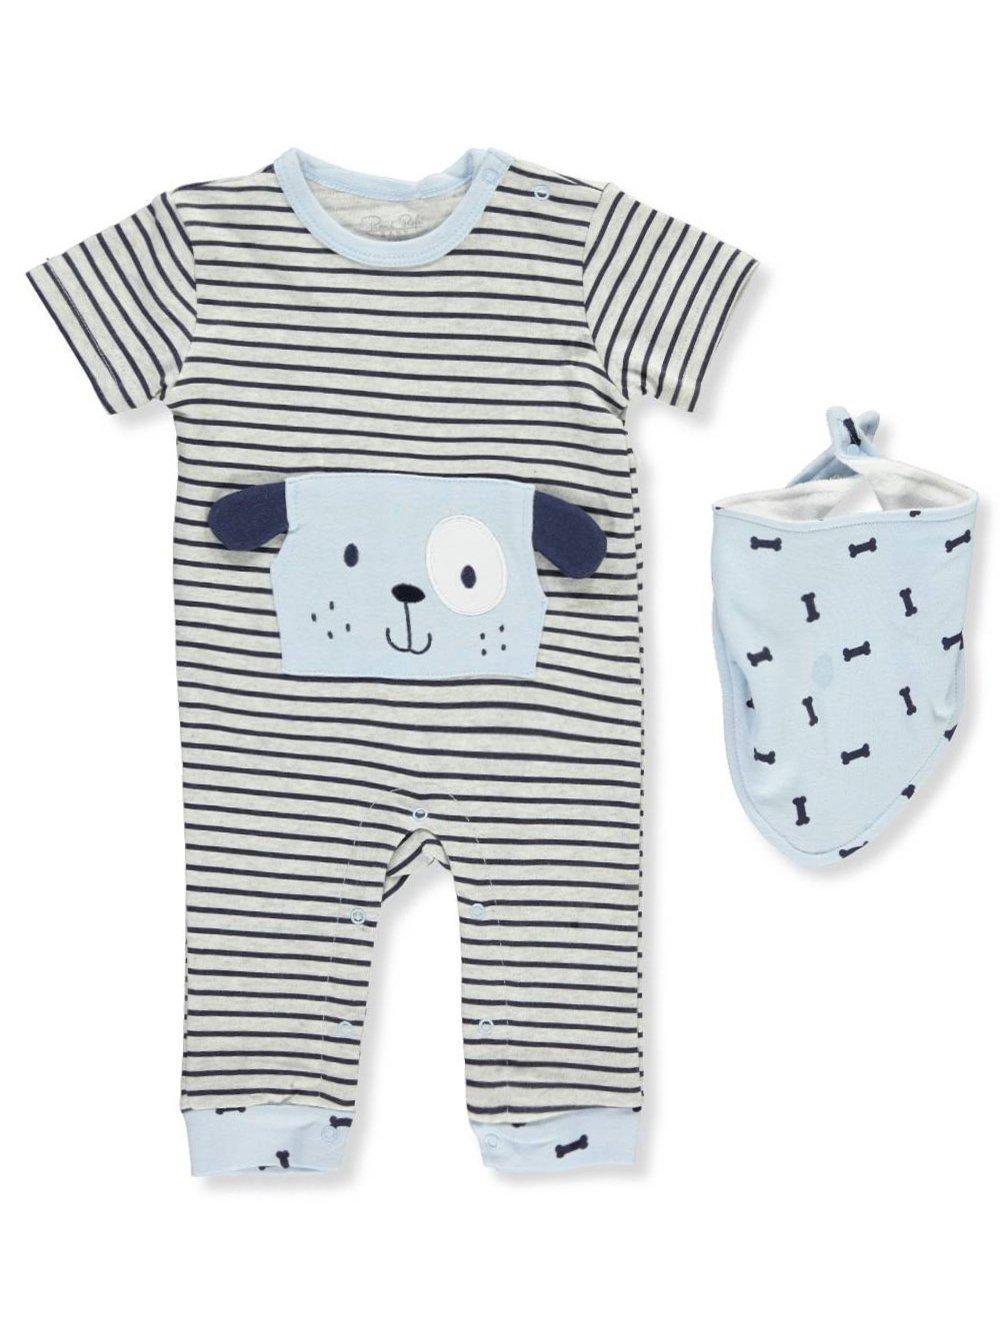 Rene Rofe Baby Boys' 2-Piece Layette Set 6 - 9 months